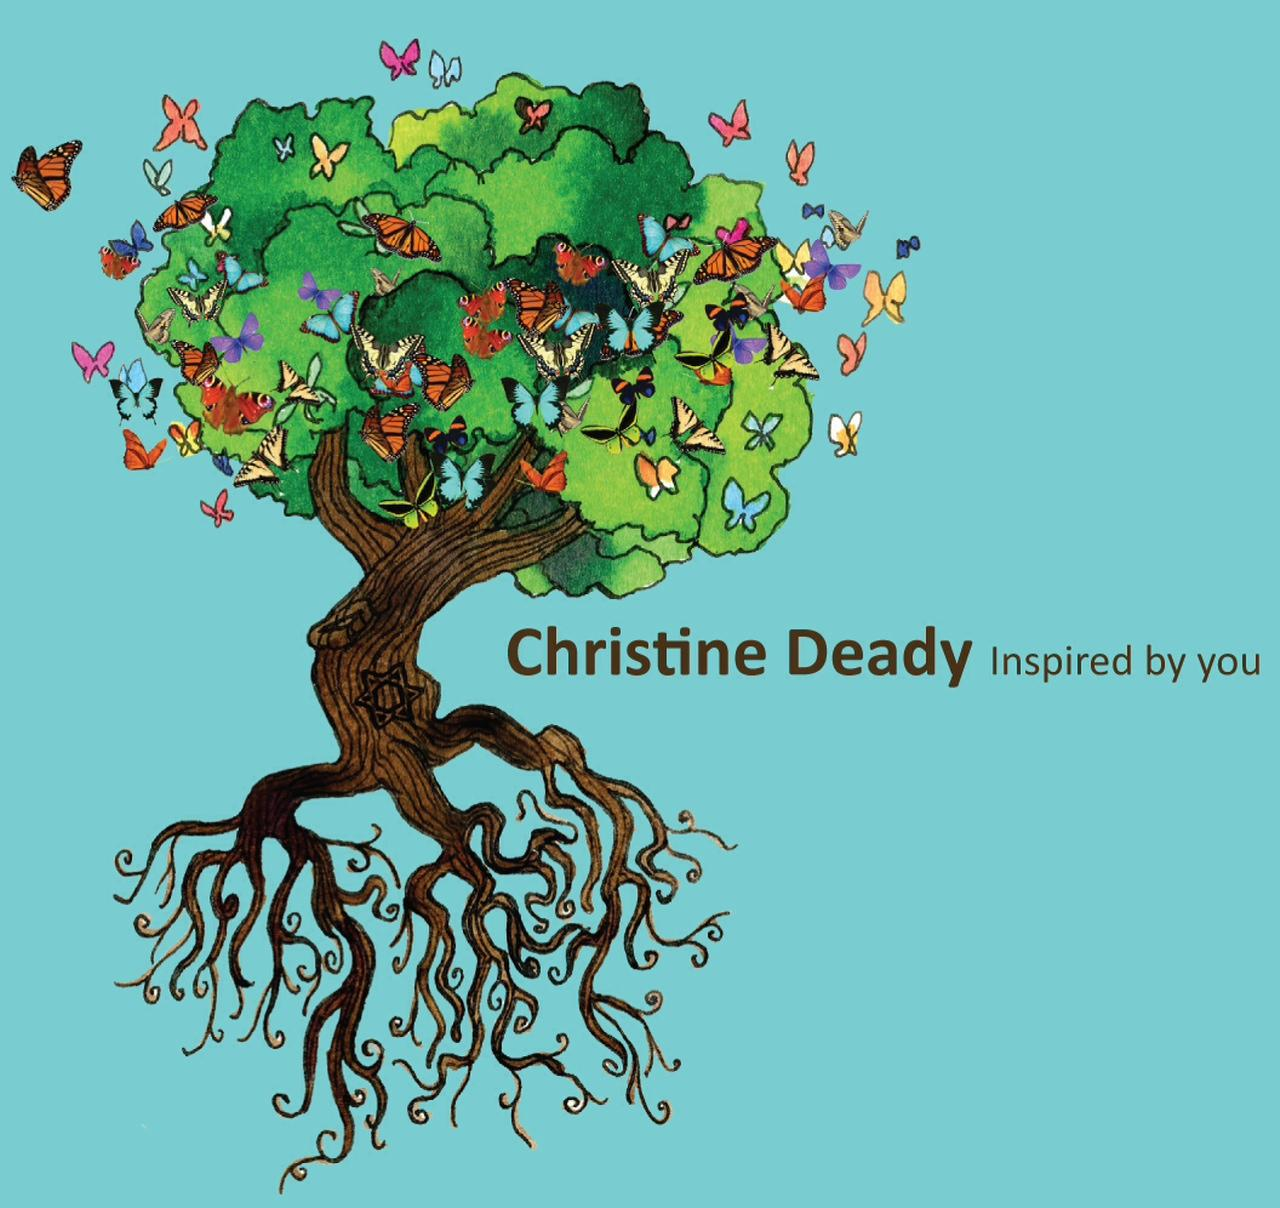 Christine Deady